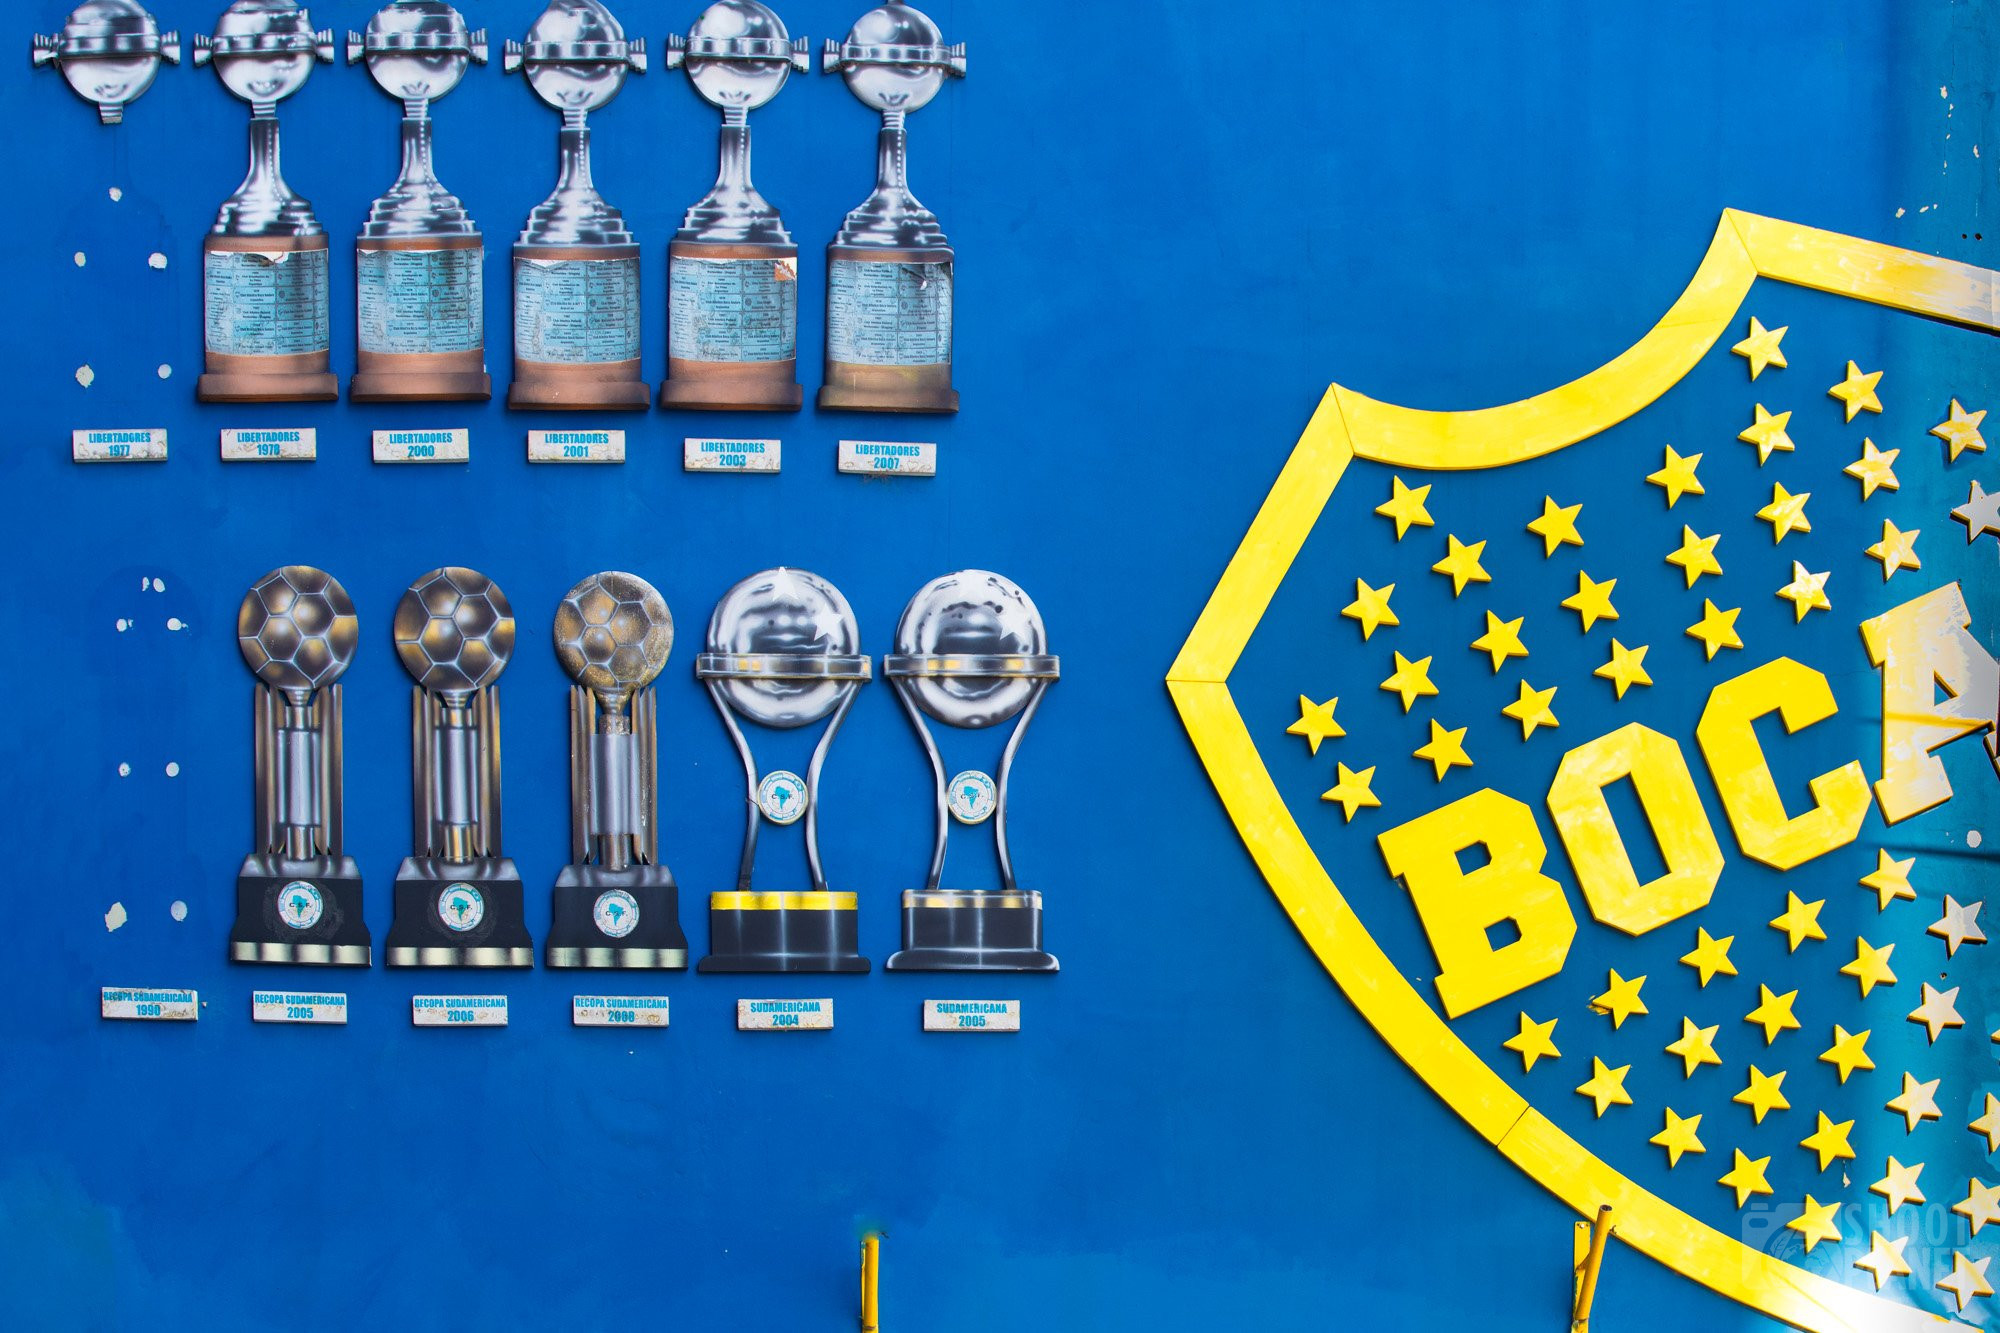 Football cups, La Bocca, Buenos Aires Argentina